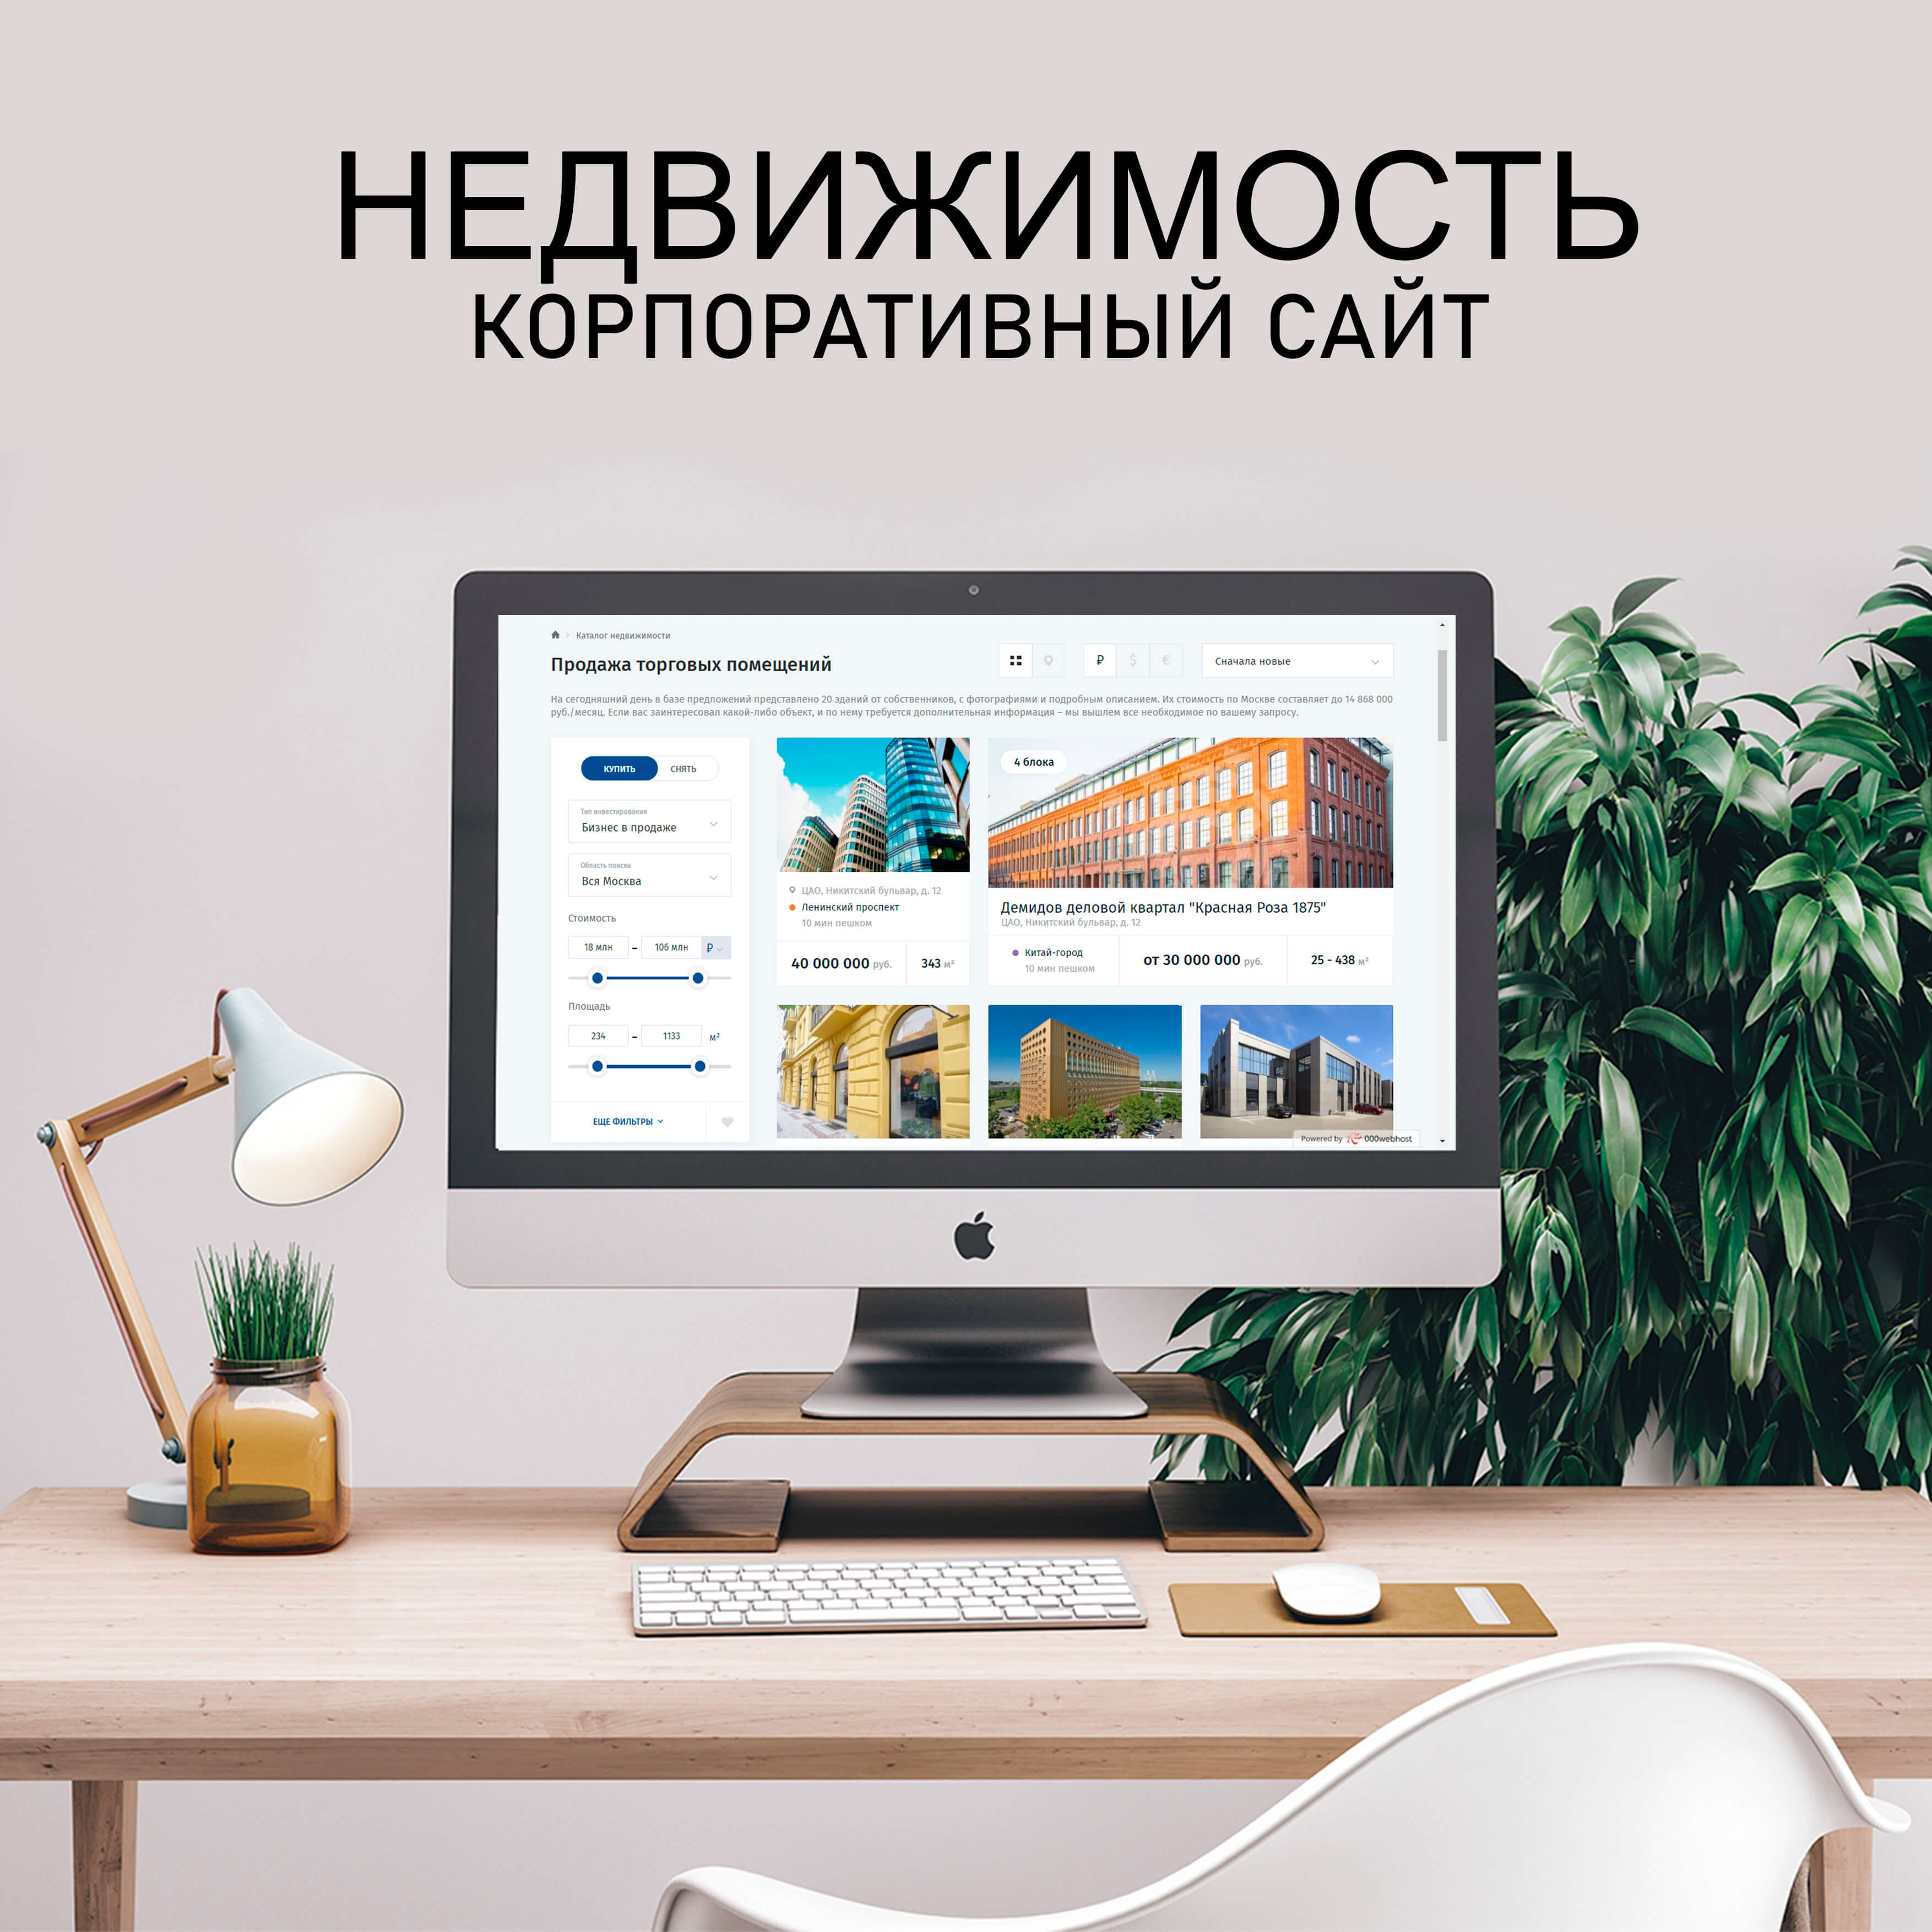 Корпоративный сайт недвижимости